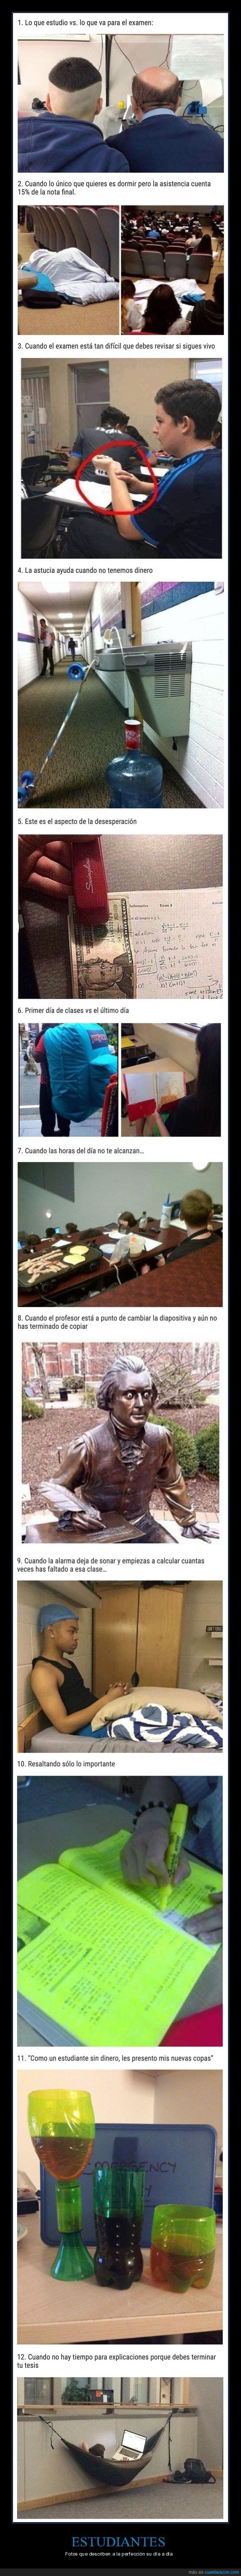 estudiantes,vida